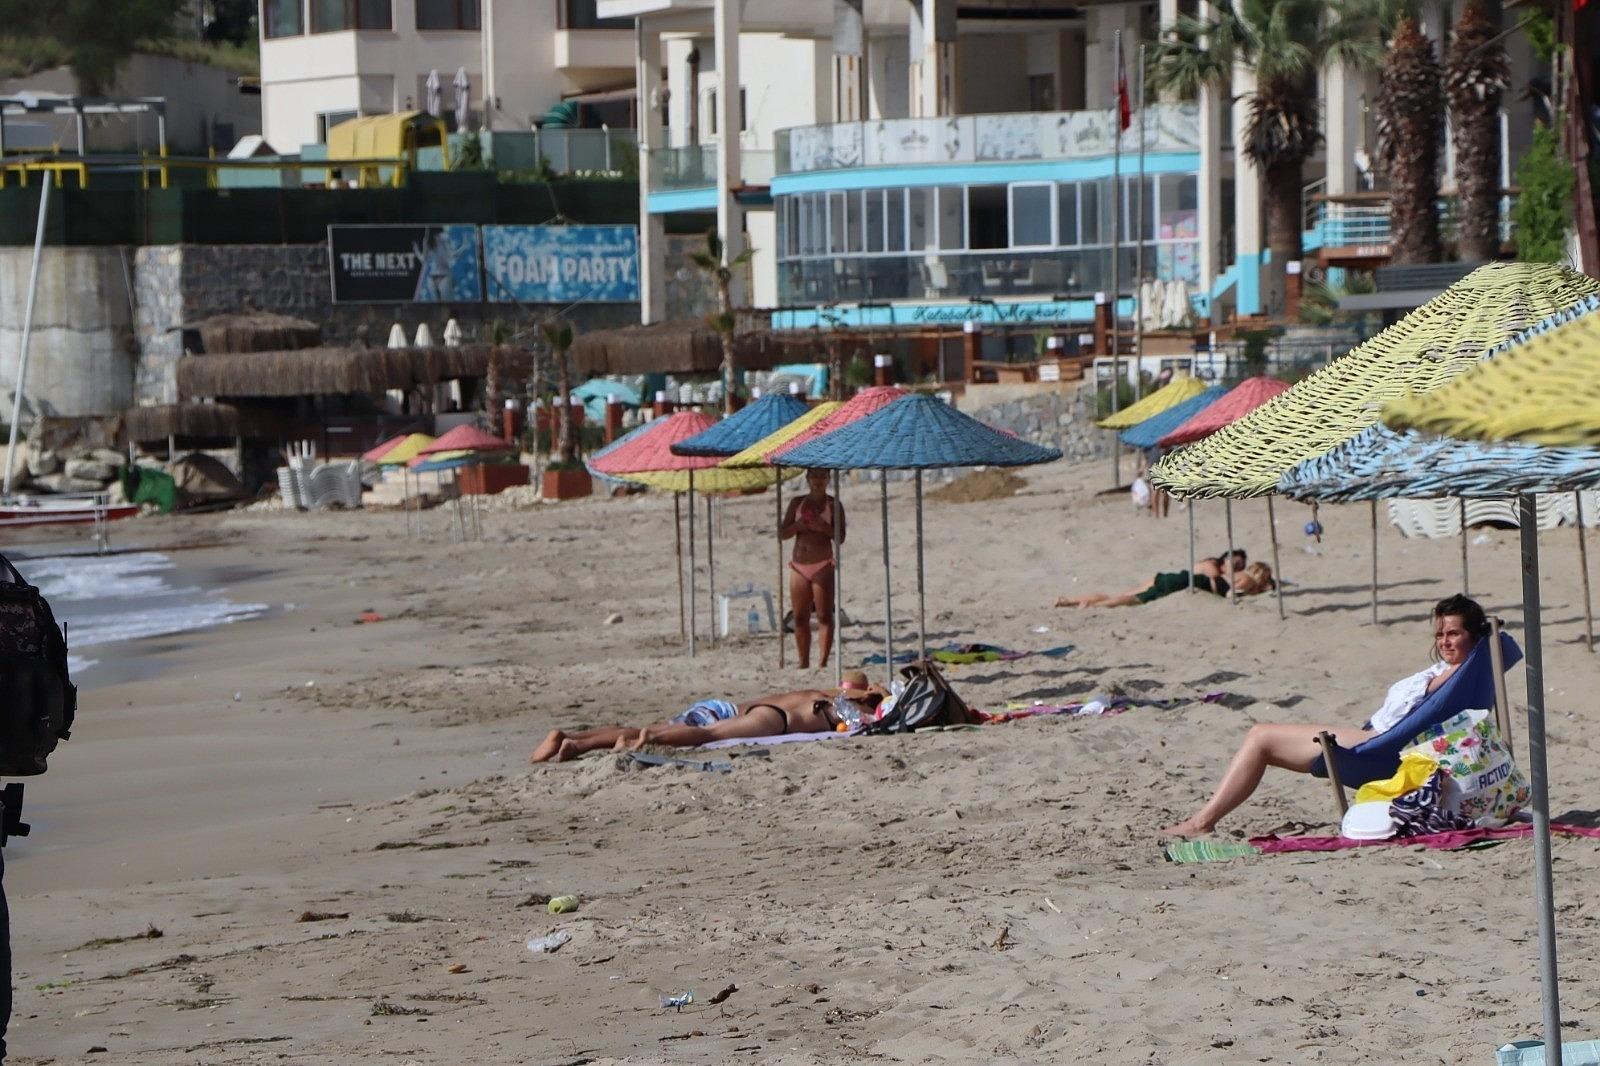 2021/05/kusadasinda-turistler-sahile-akin-etti-20210506AW31-1.jpg